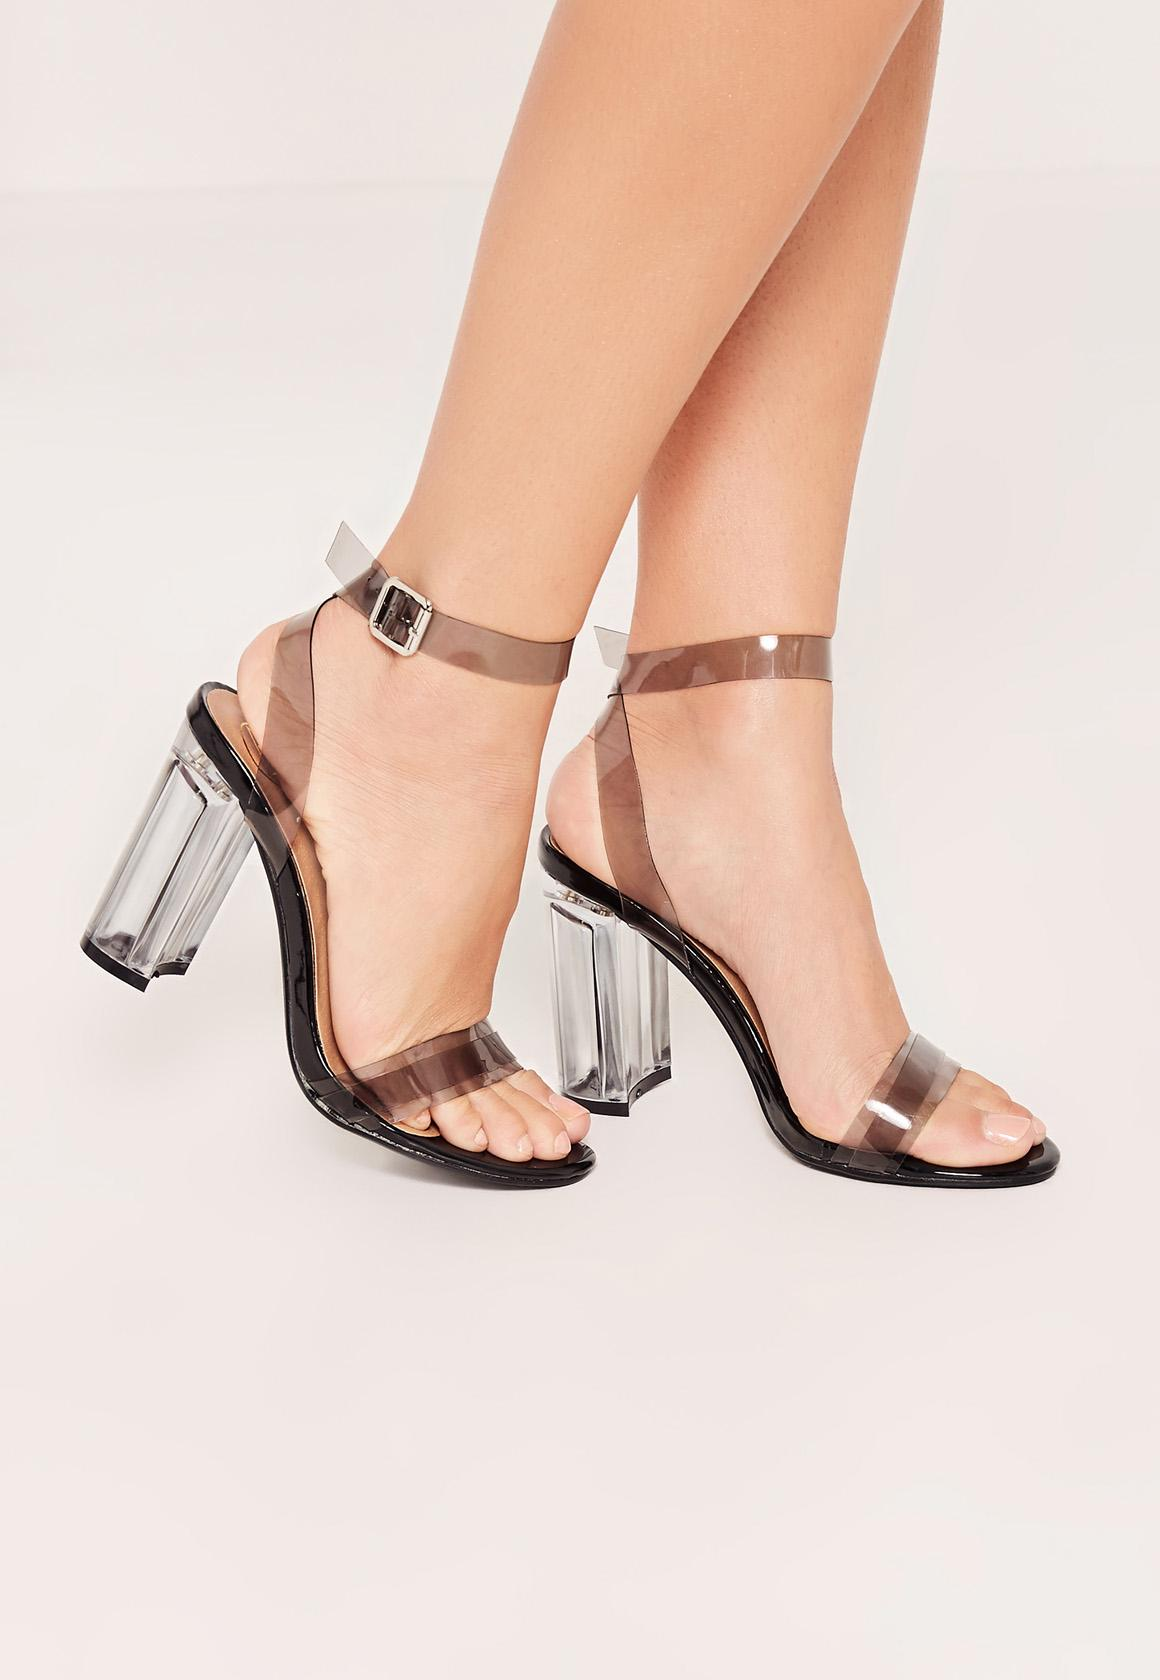 chaussure talon plastique. Black Bedroom Furniture Sets. Home Design Ideas